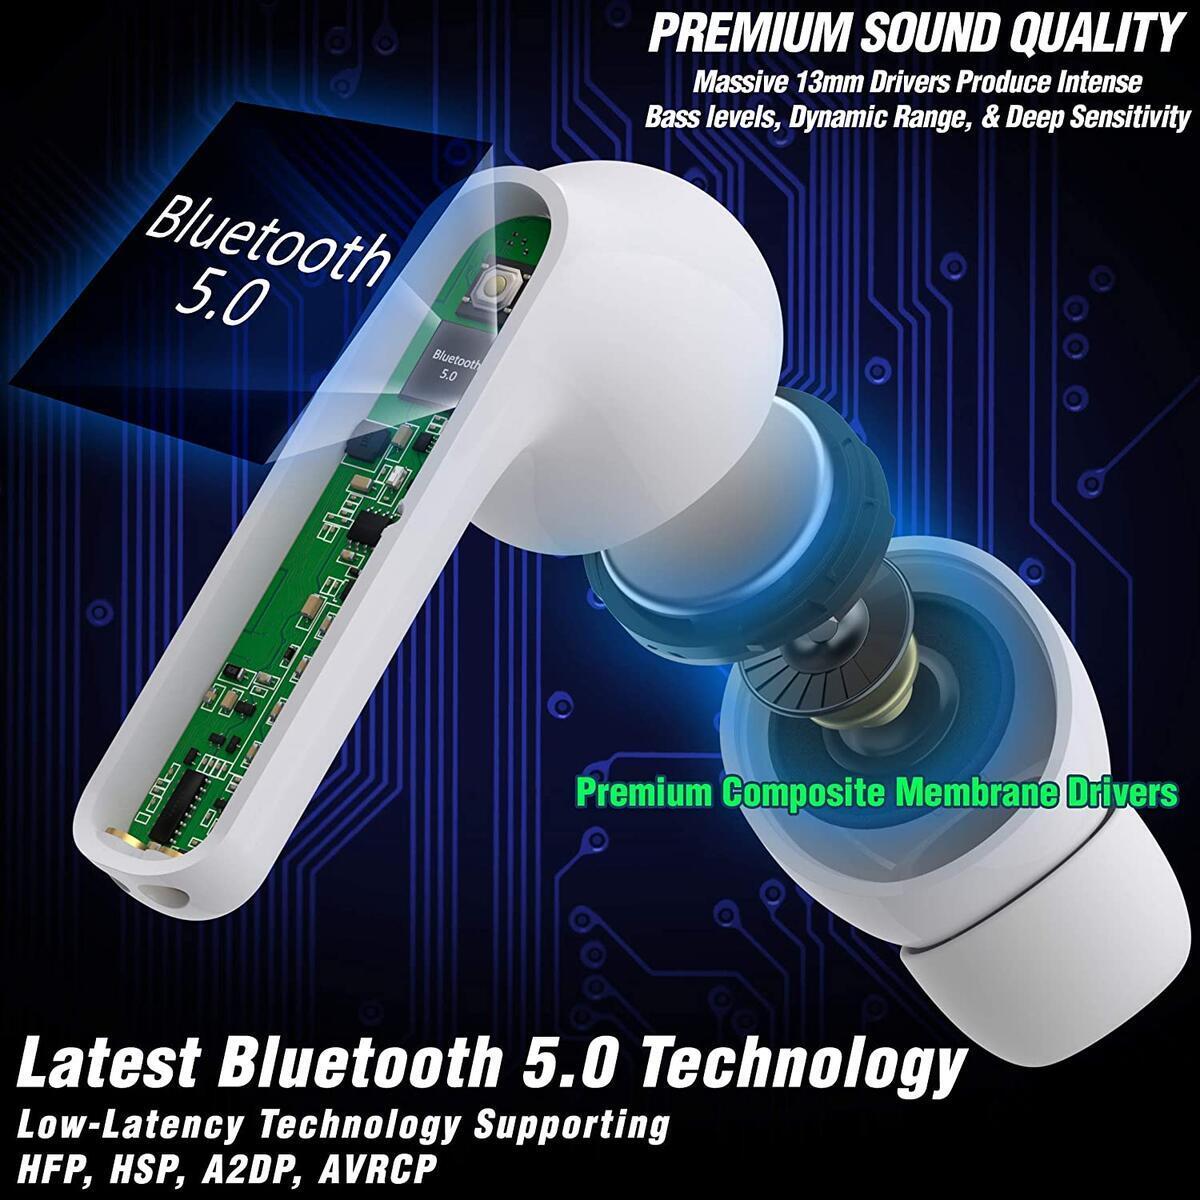 Senso PODS PLUS Premium Wireless Earbuds